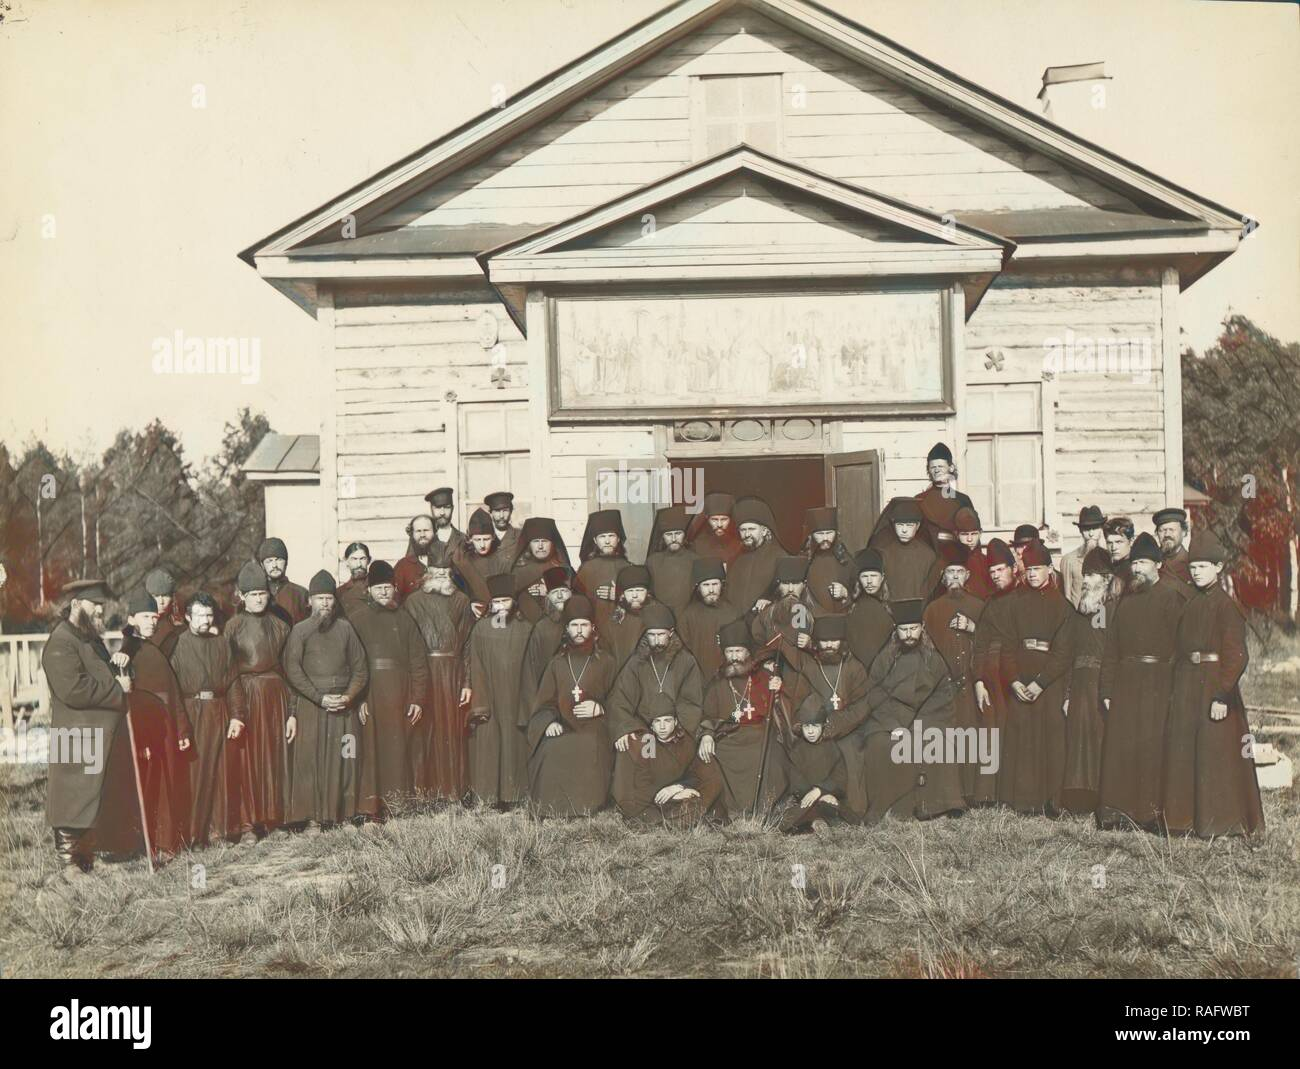 Makarevsky Retreat, Group of priests, Karl Karlovitz Bulla (Russian, 1854 - 1929), 1913, Gelatin silver print, 16.8 x reimagined - Stock Image